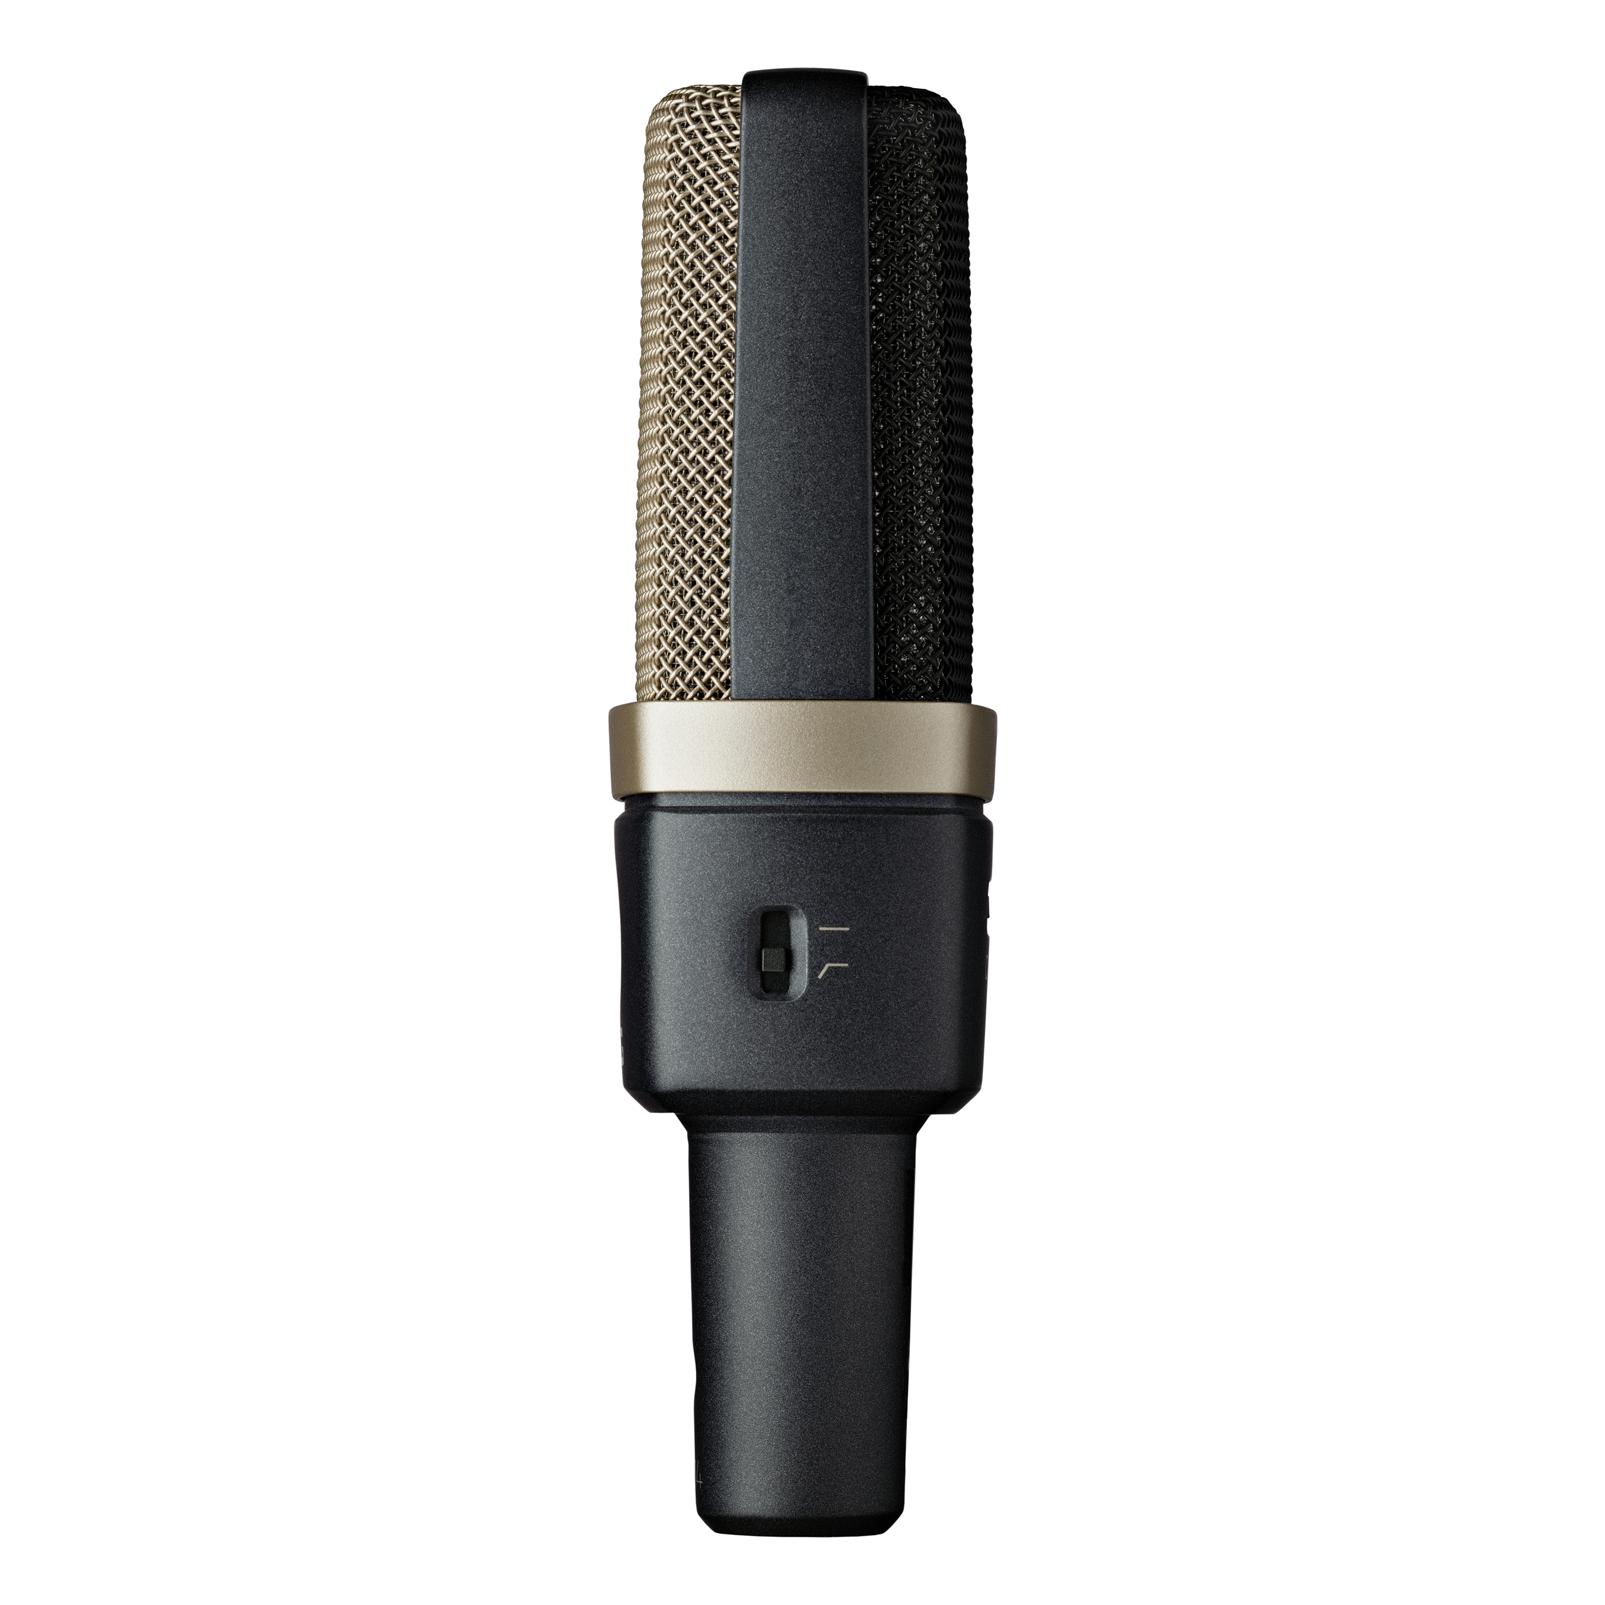 C314 - Black - Professional multi-pattern condenser microphone - Detailshot 2